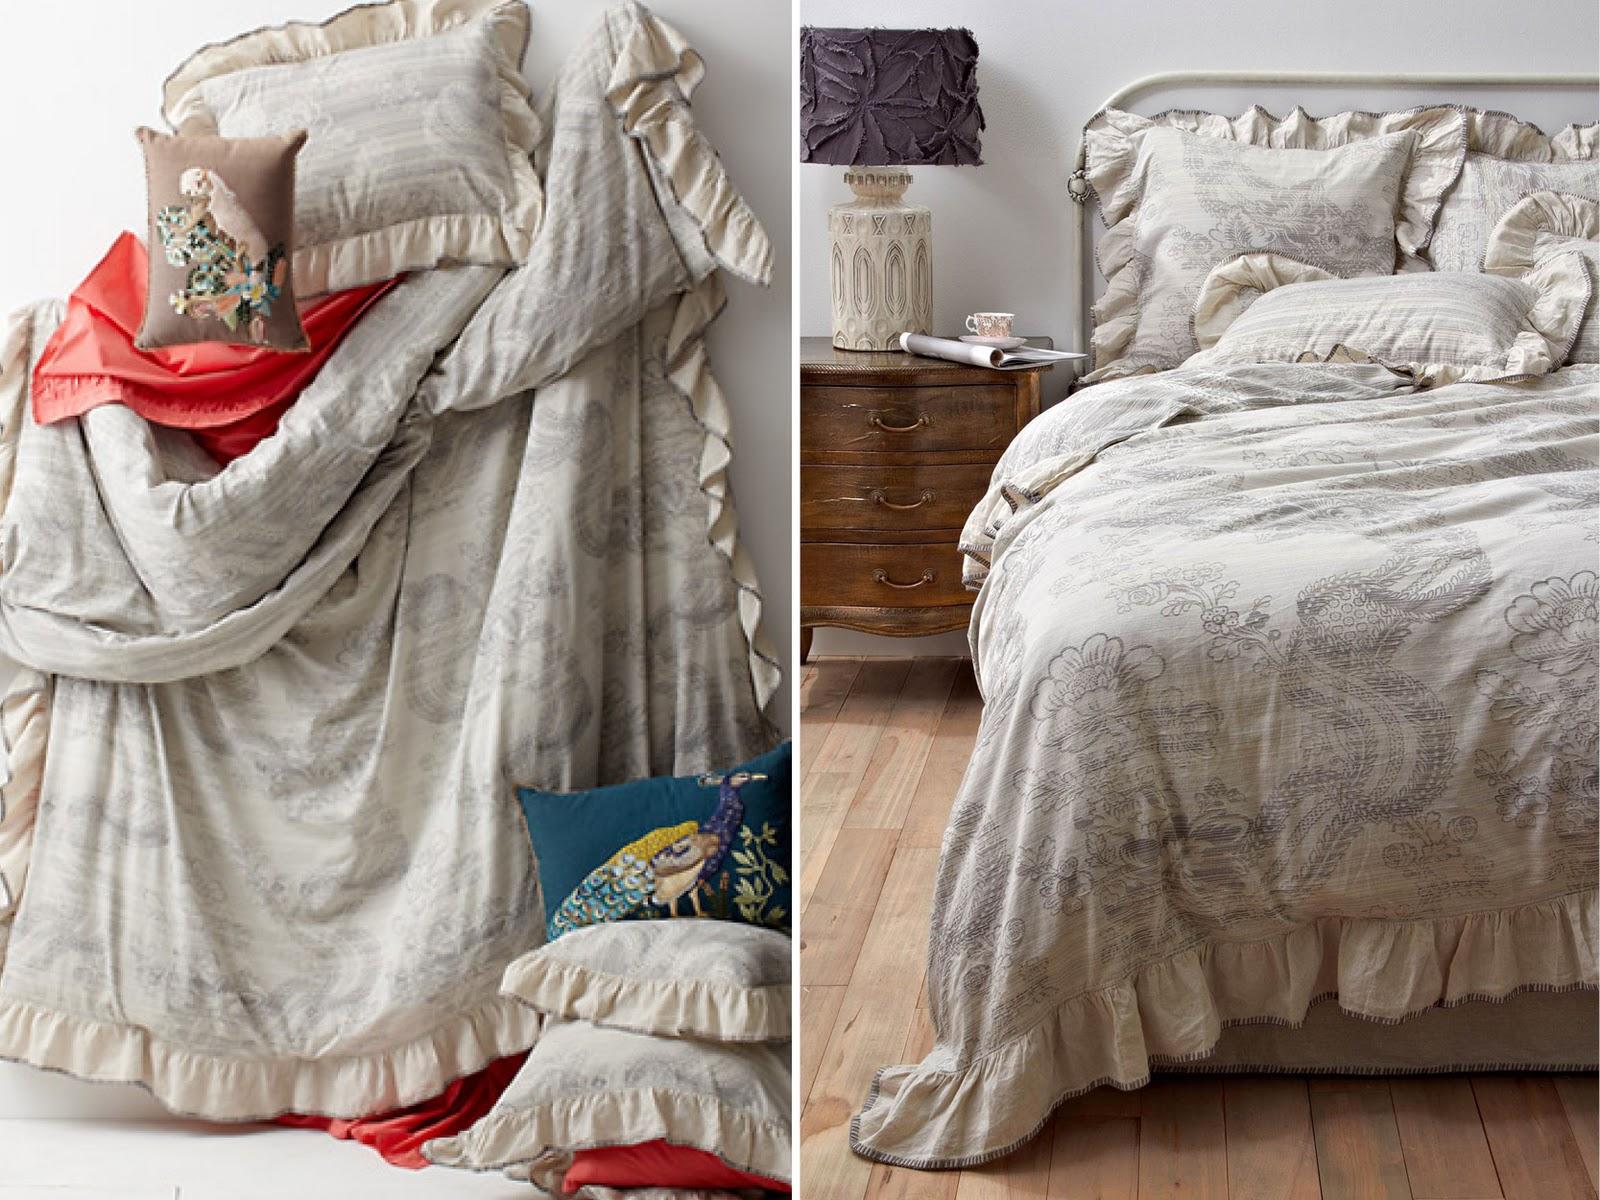 Bedroom Decor Bundles